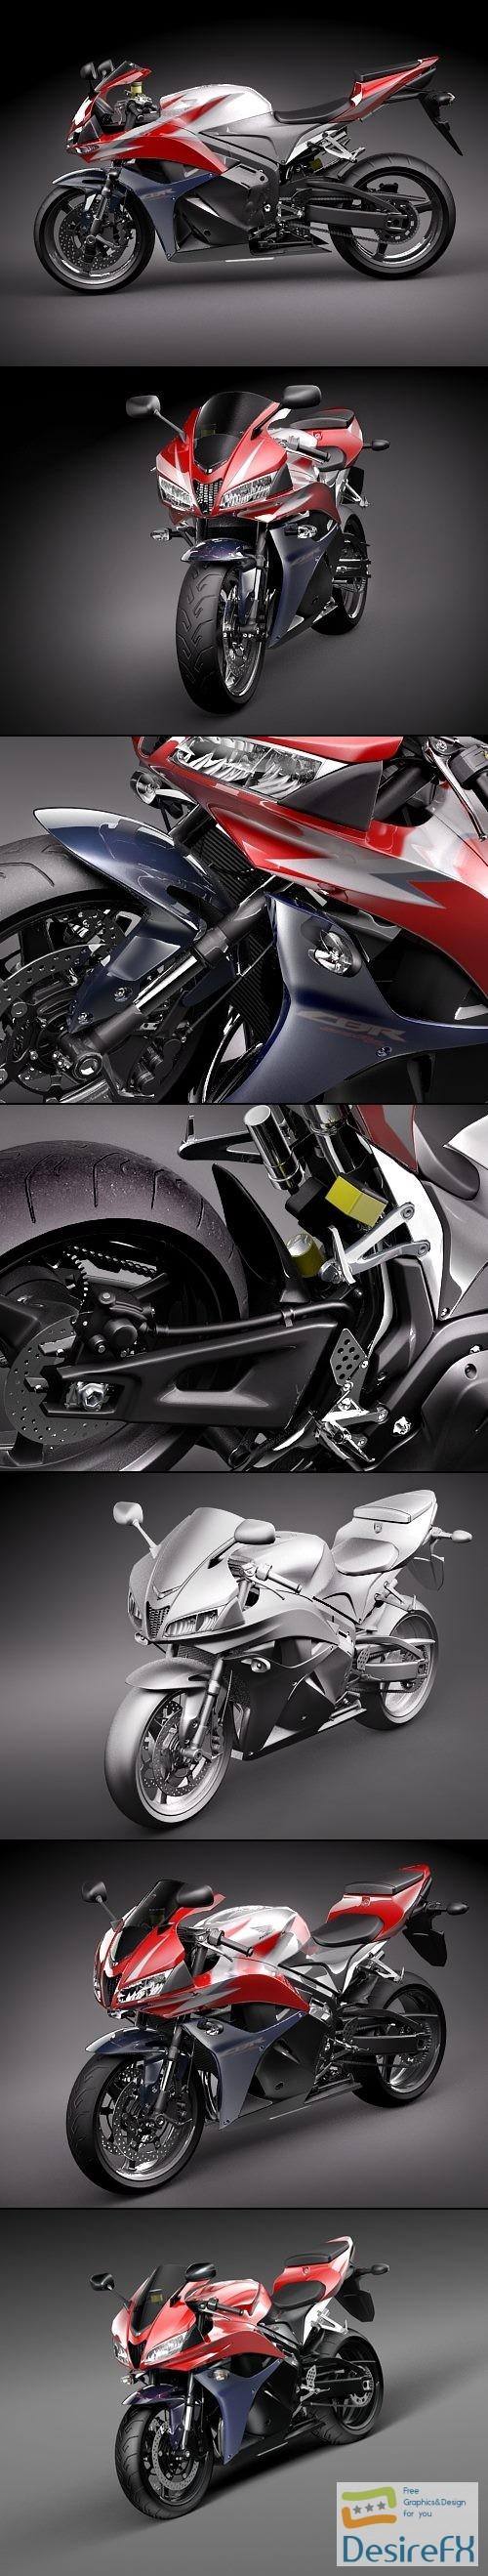 Honda CBR 600RR 2009 3D Model